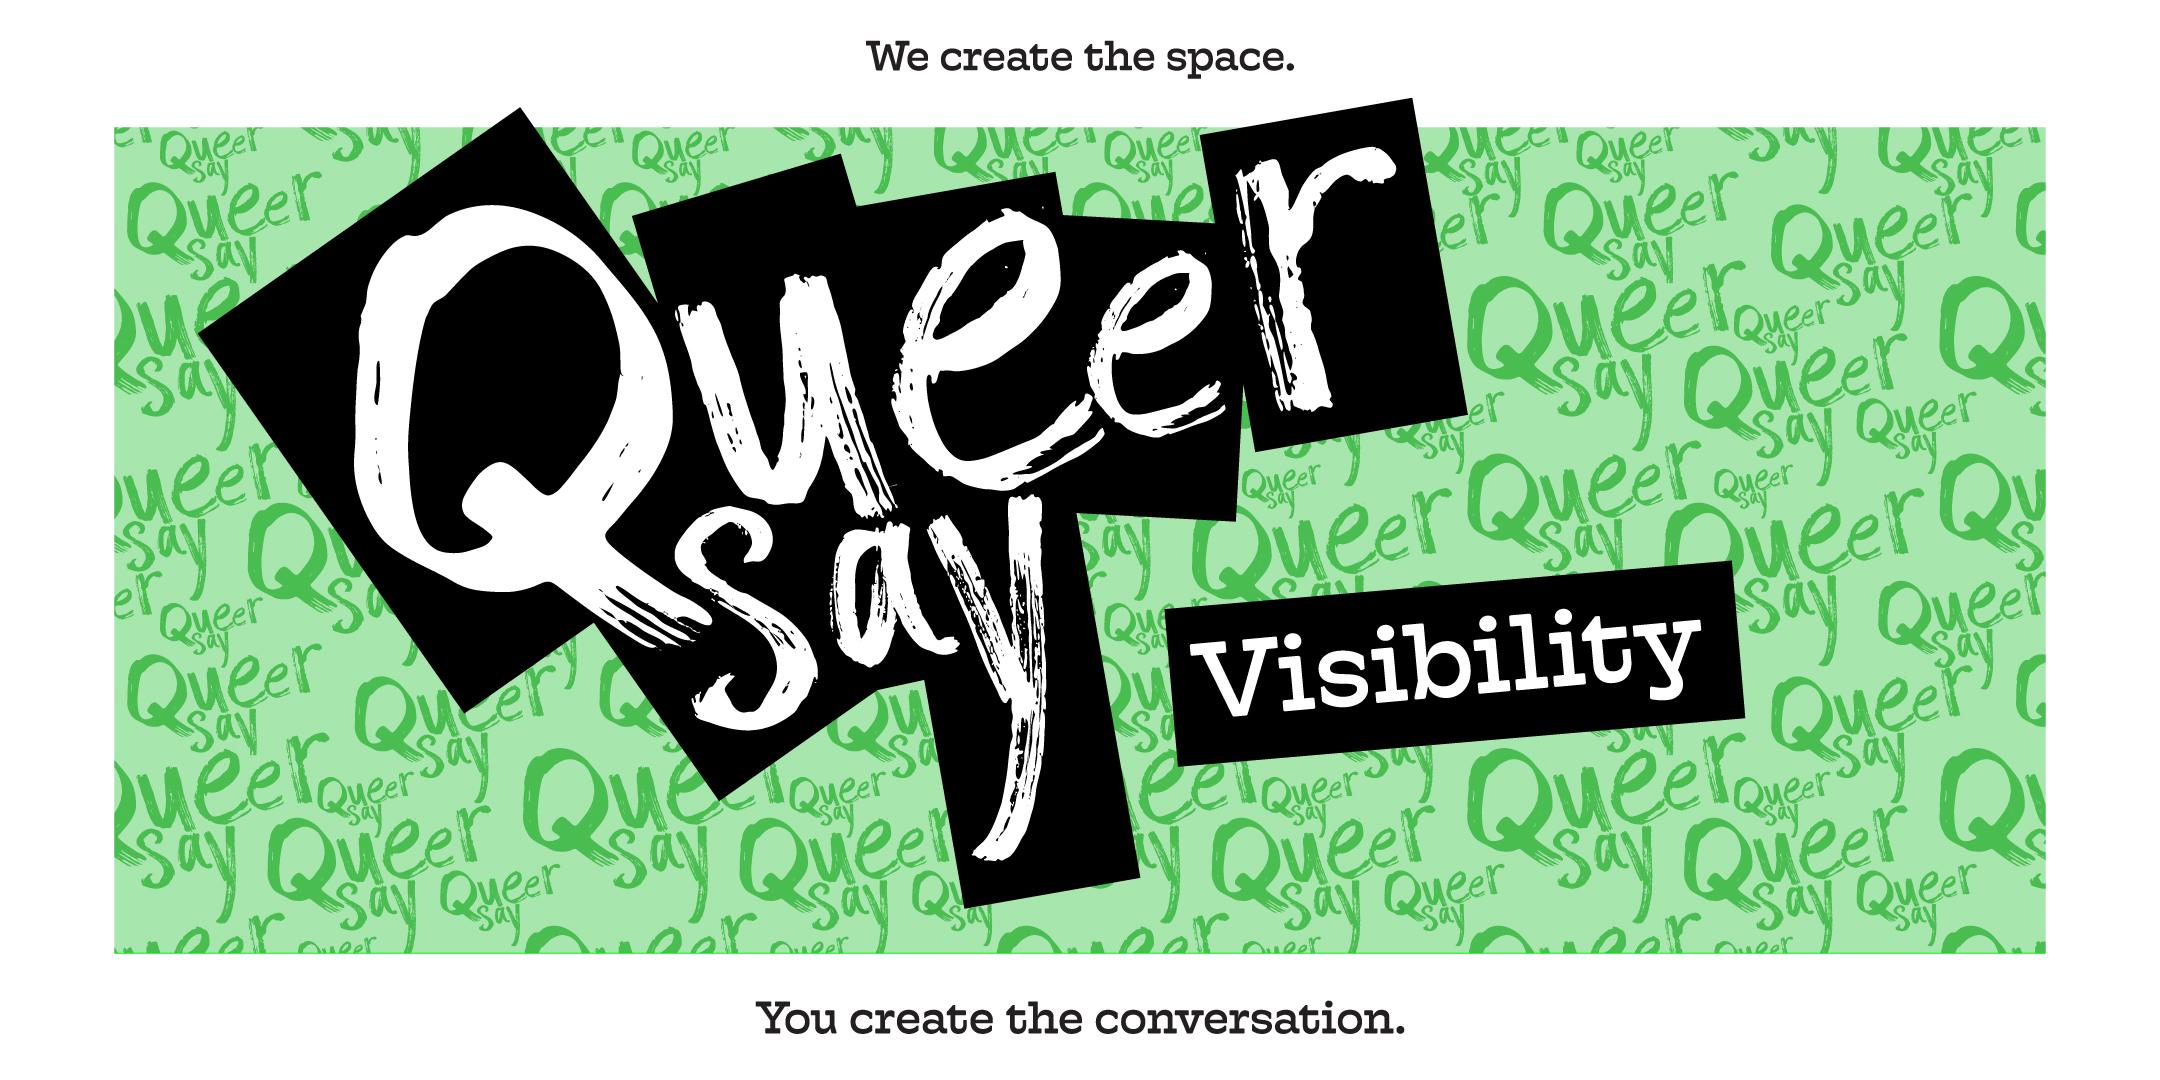 QueersaySocialEventBrite.jpg